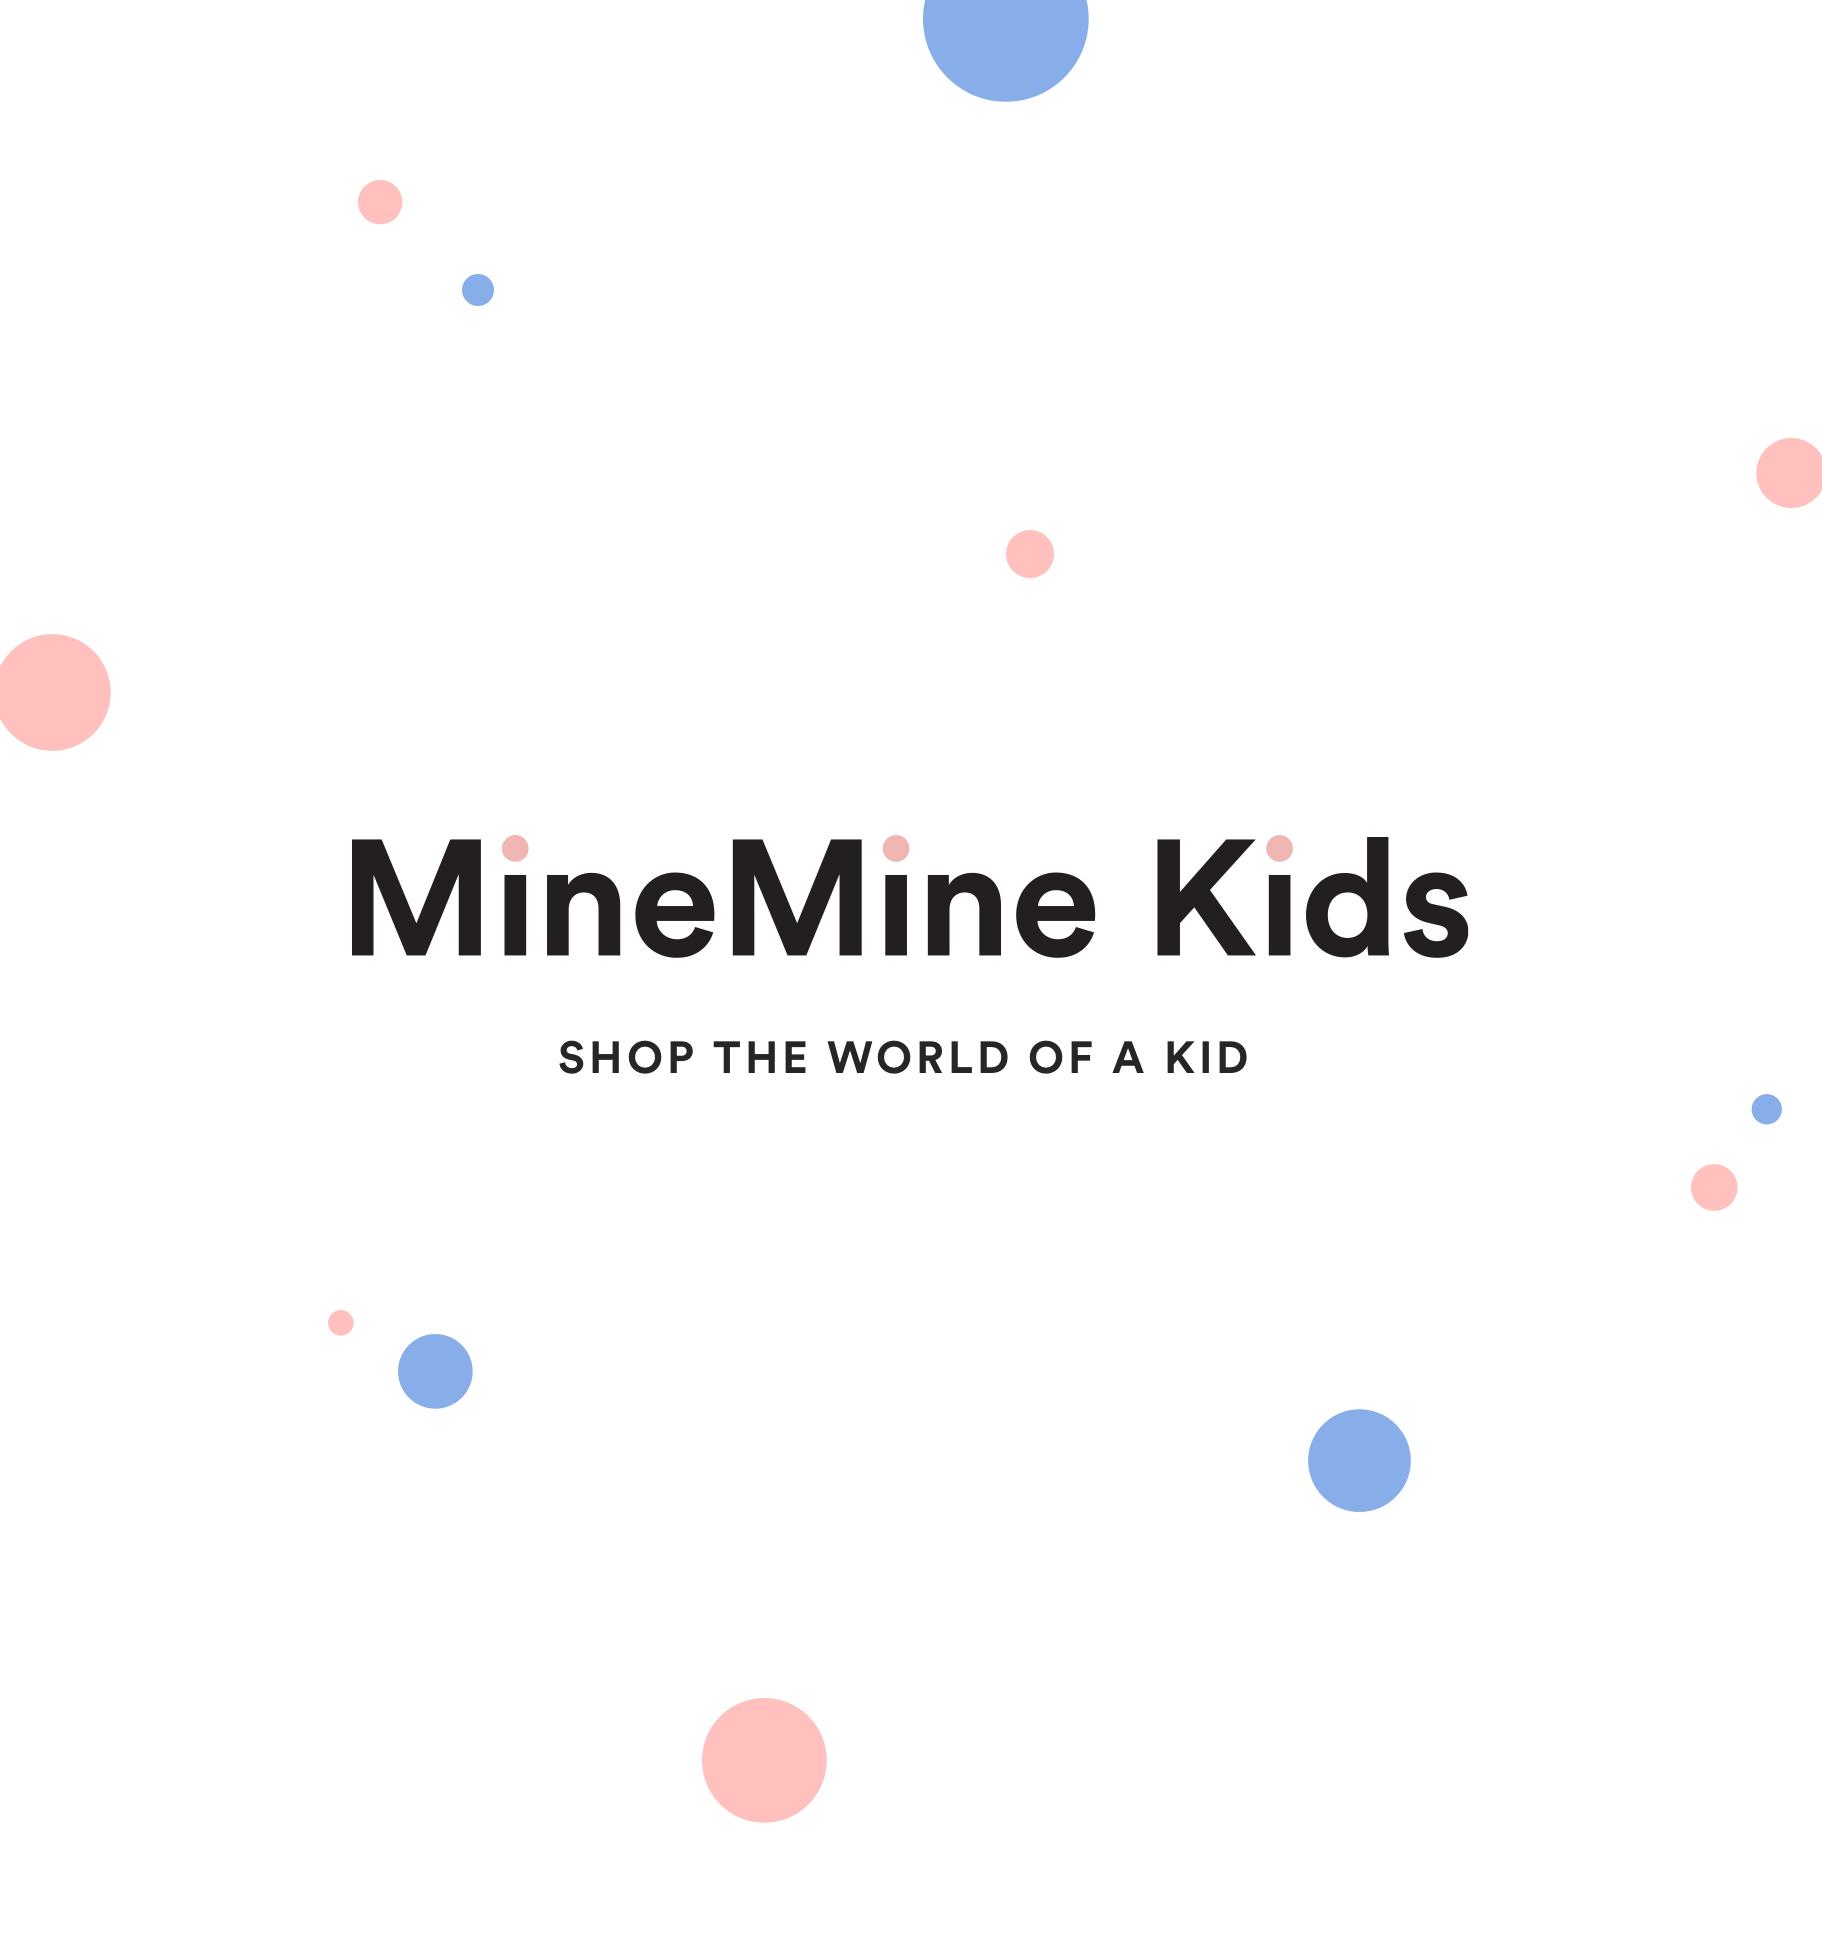 MineMine Kids Online Shop  Branding / UI/UX - 2016